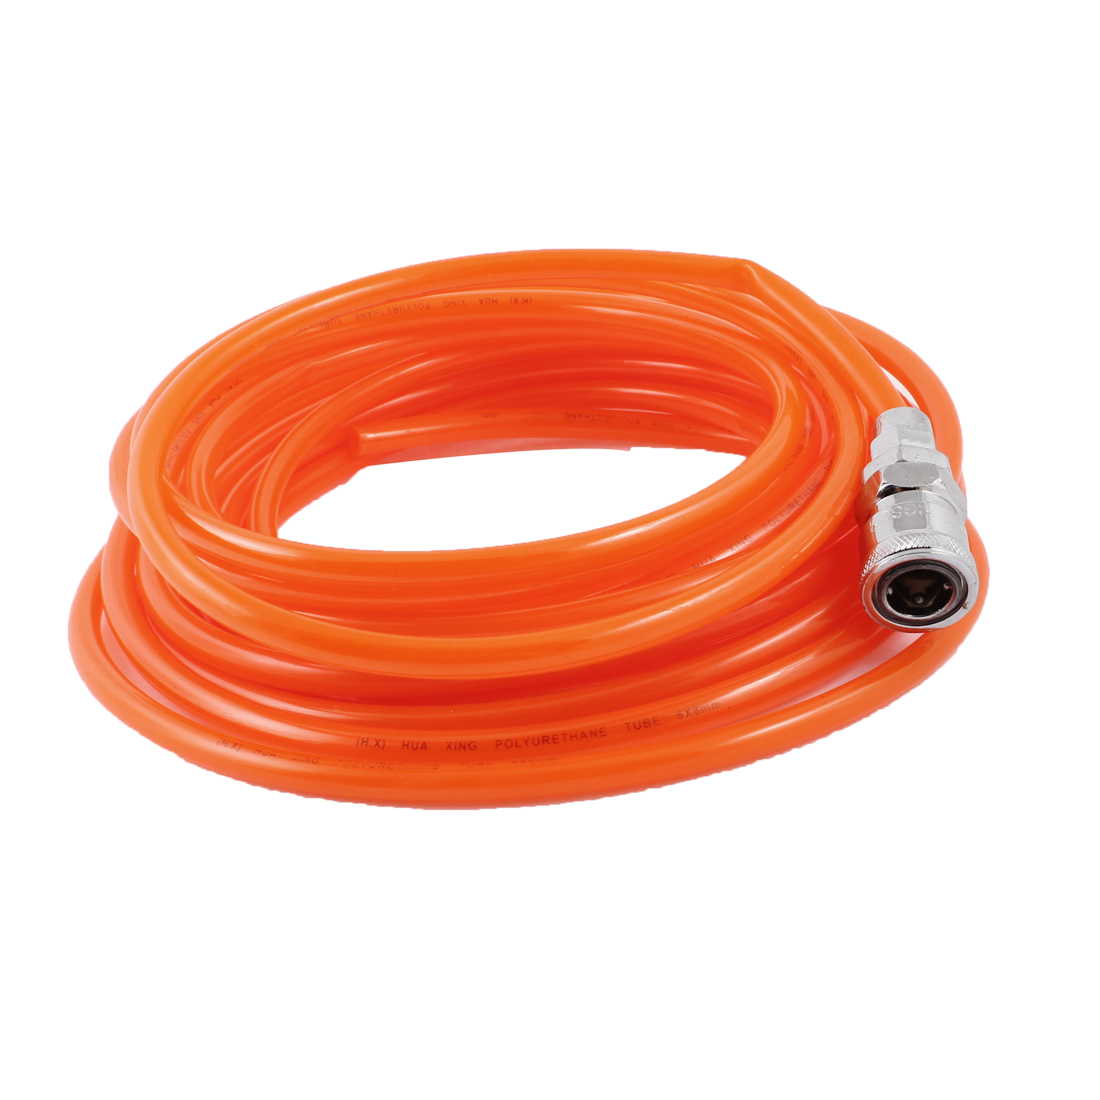 "19M Length 5/16"" x 1/5"" Quick Connect Polyurethane Tube Air PU Hose Orange Red"